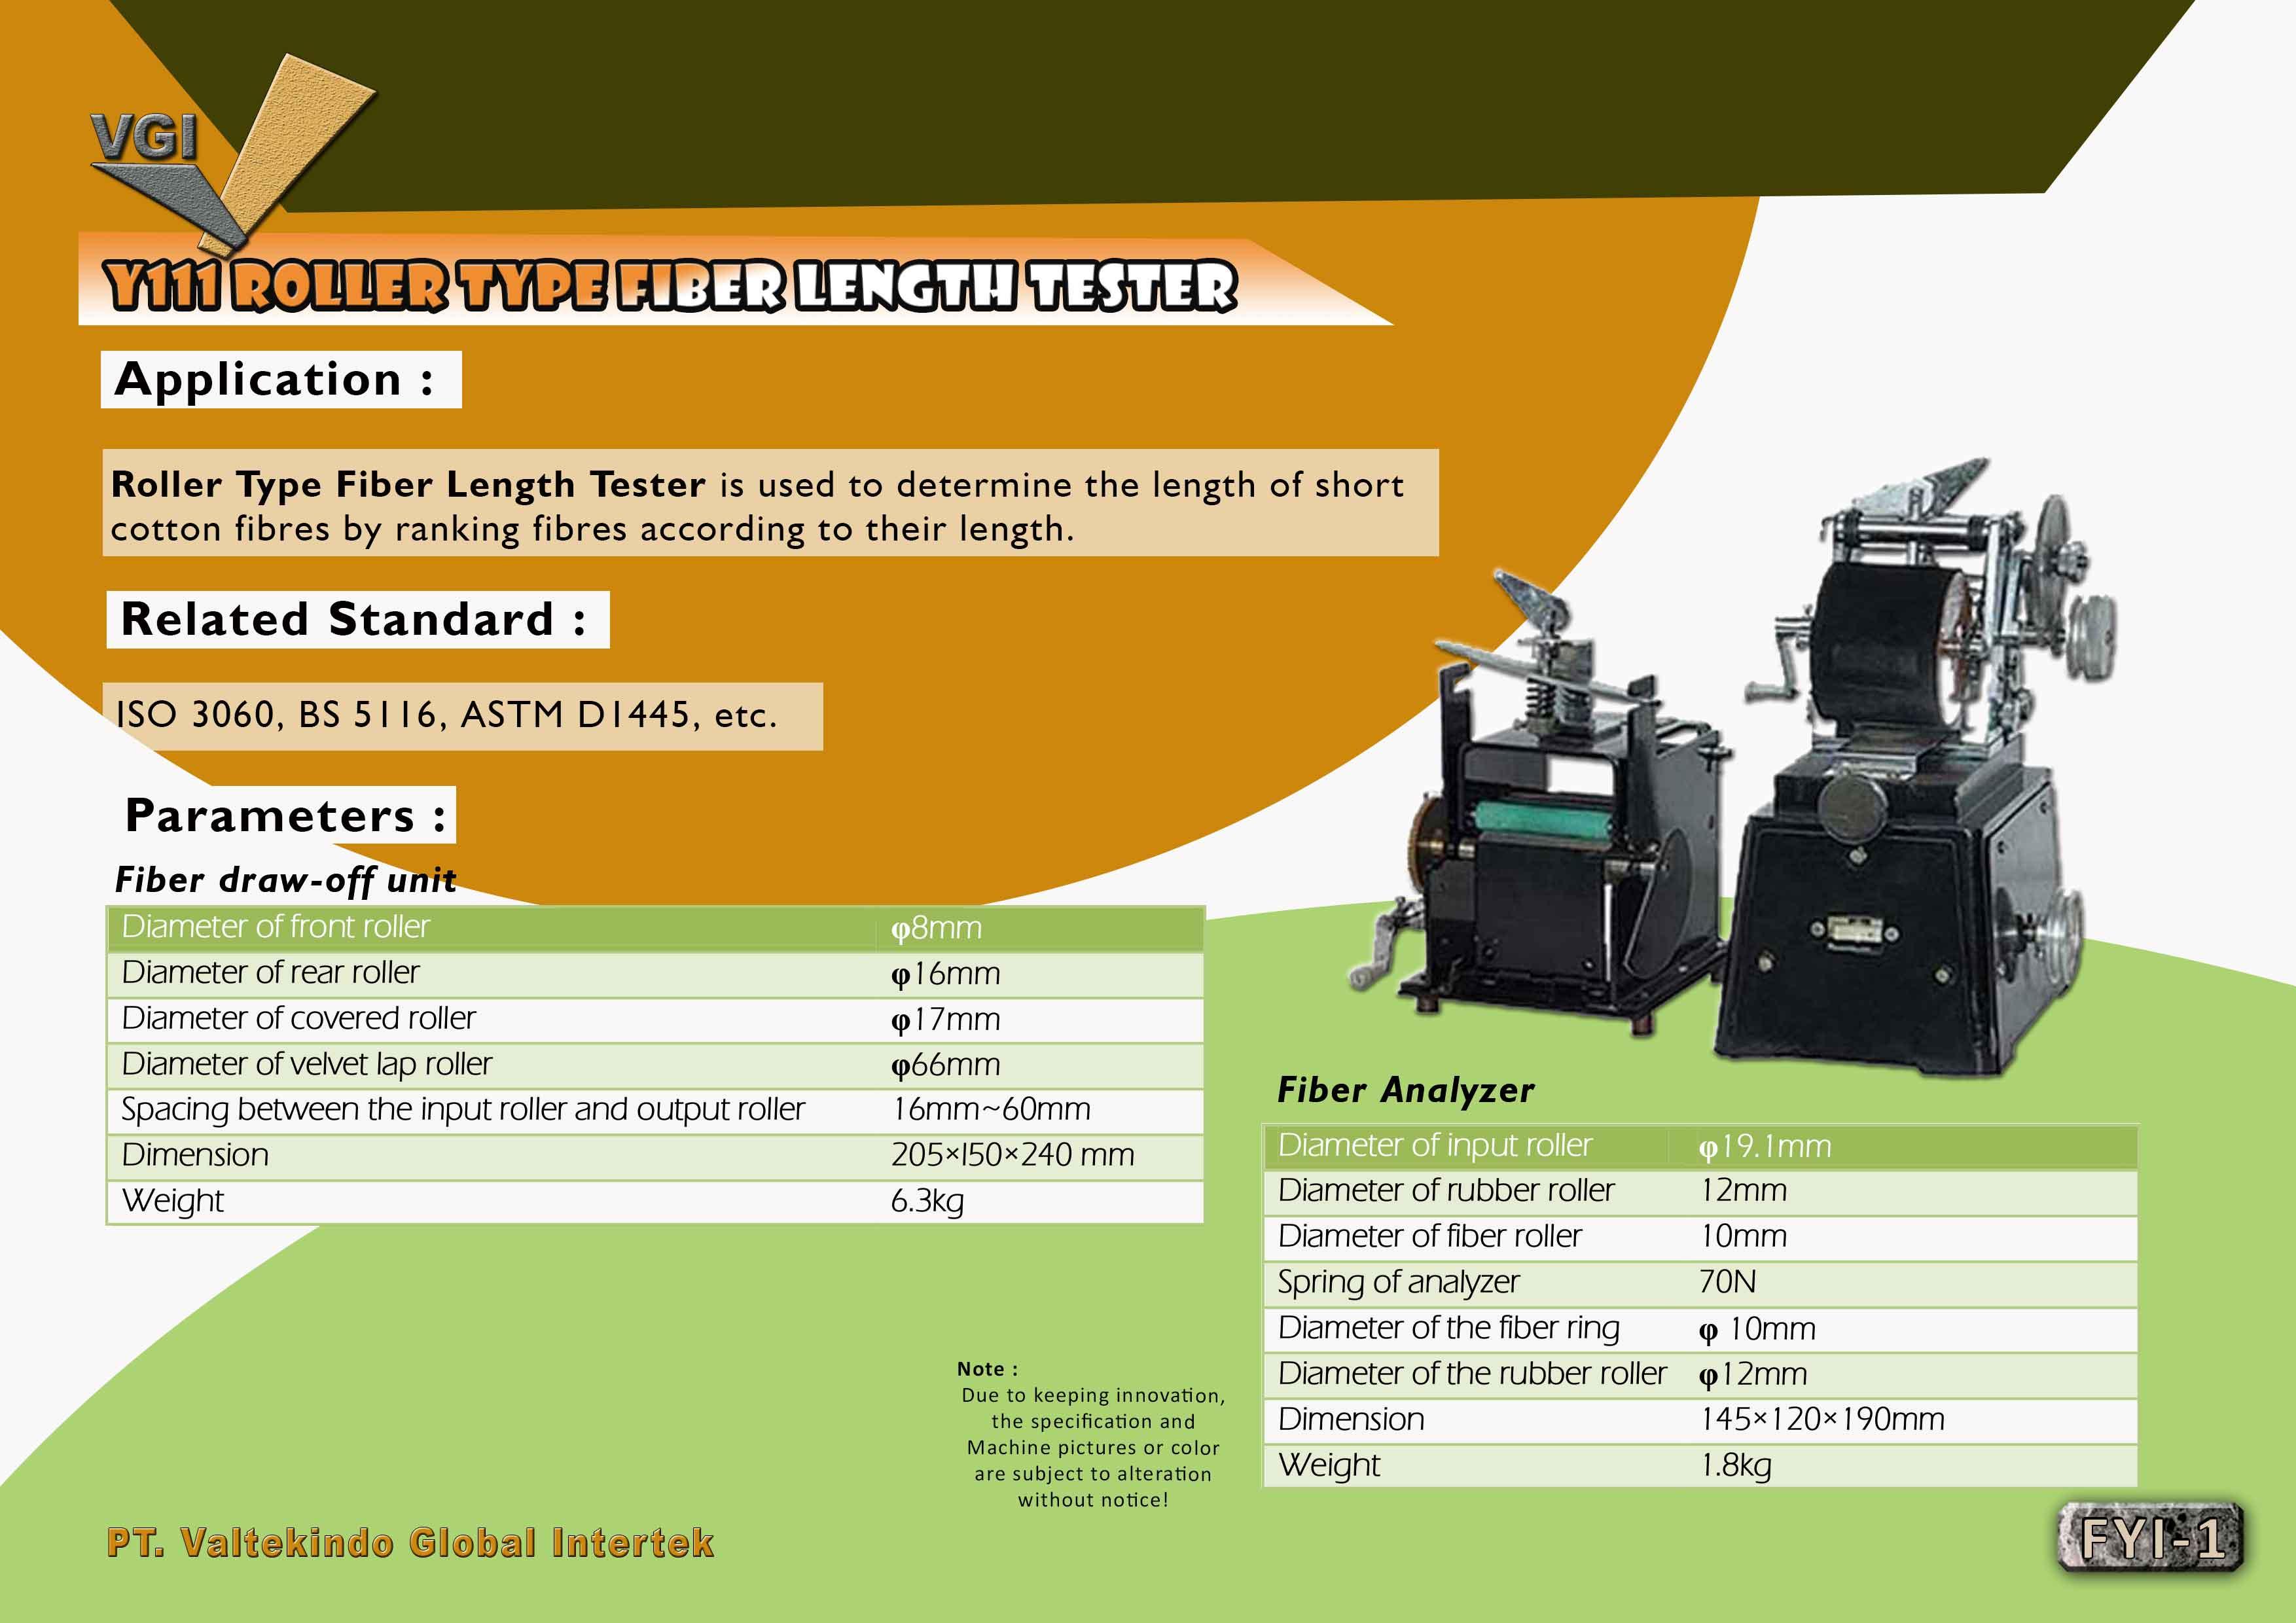 jual mesin Roller Type Fiber Length Tester  Roller Type Fiber Length Tester